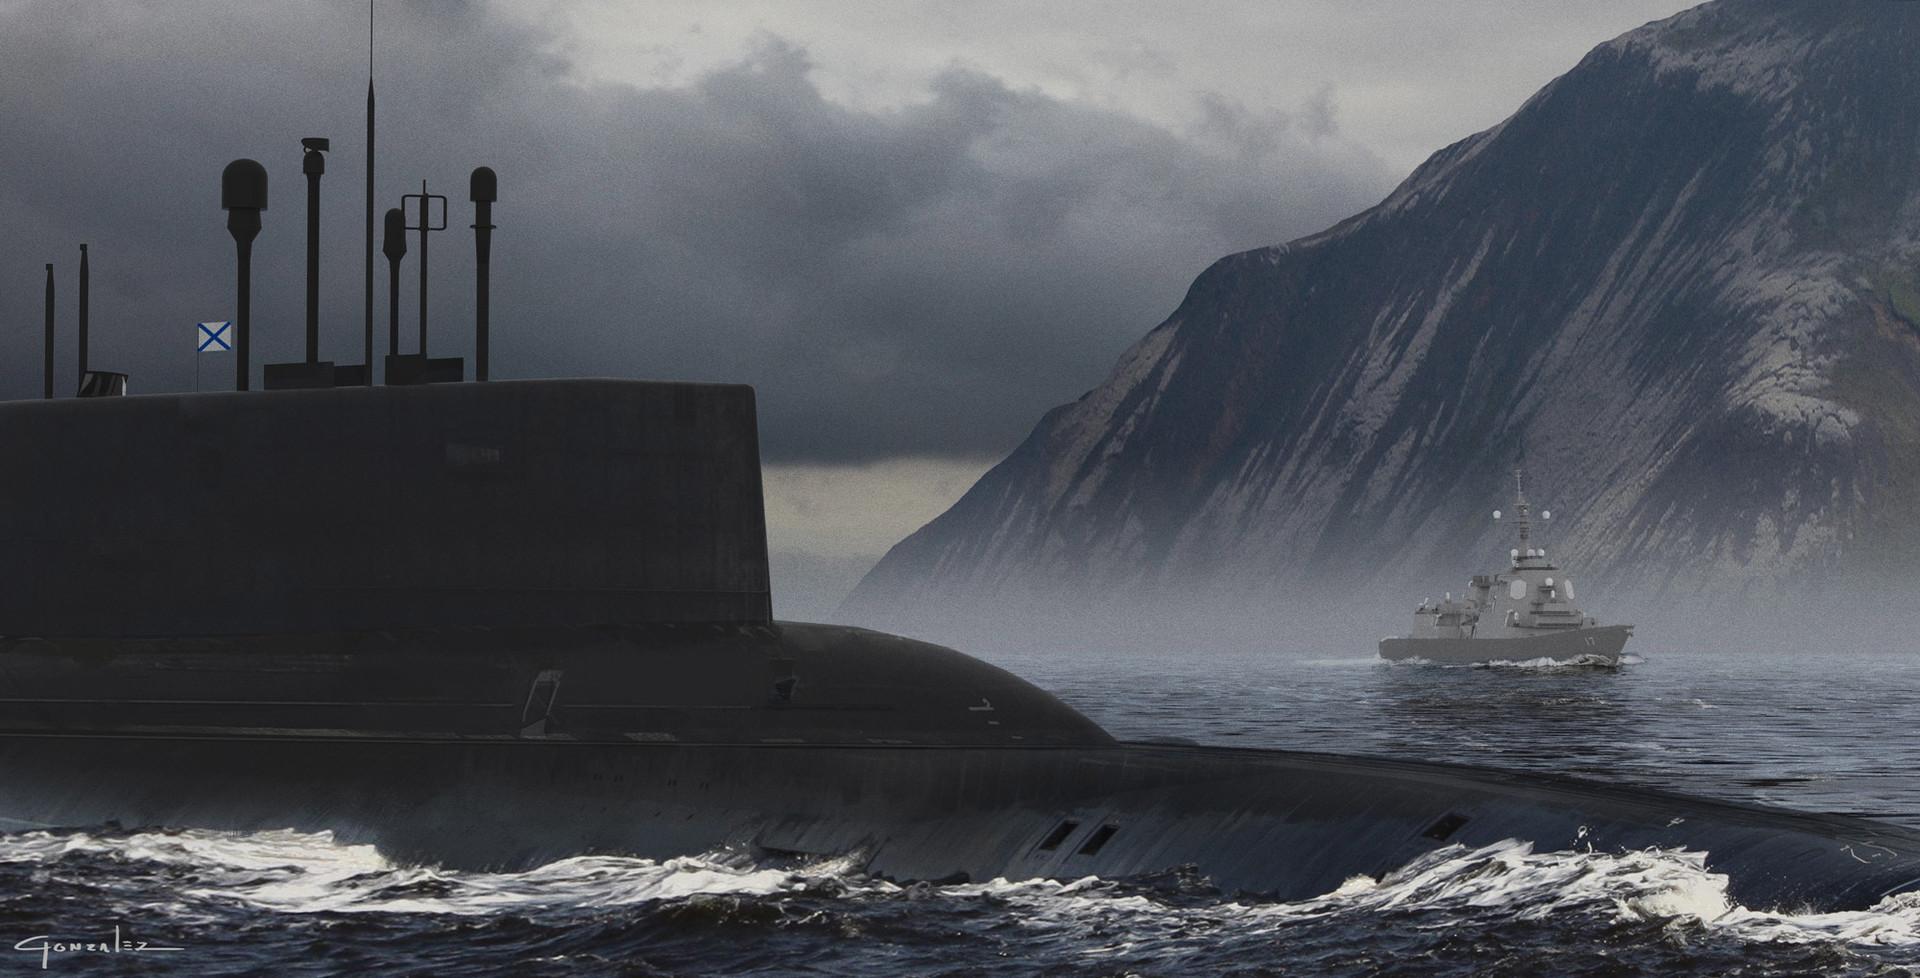 Alejandro gonzalez submarine battle concept art